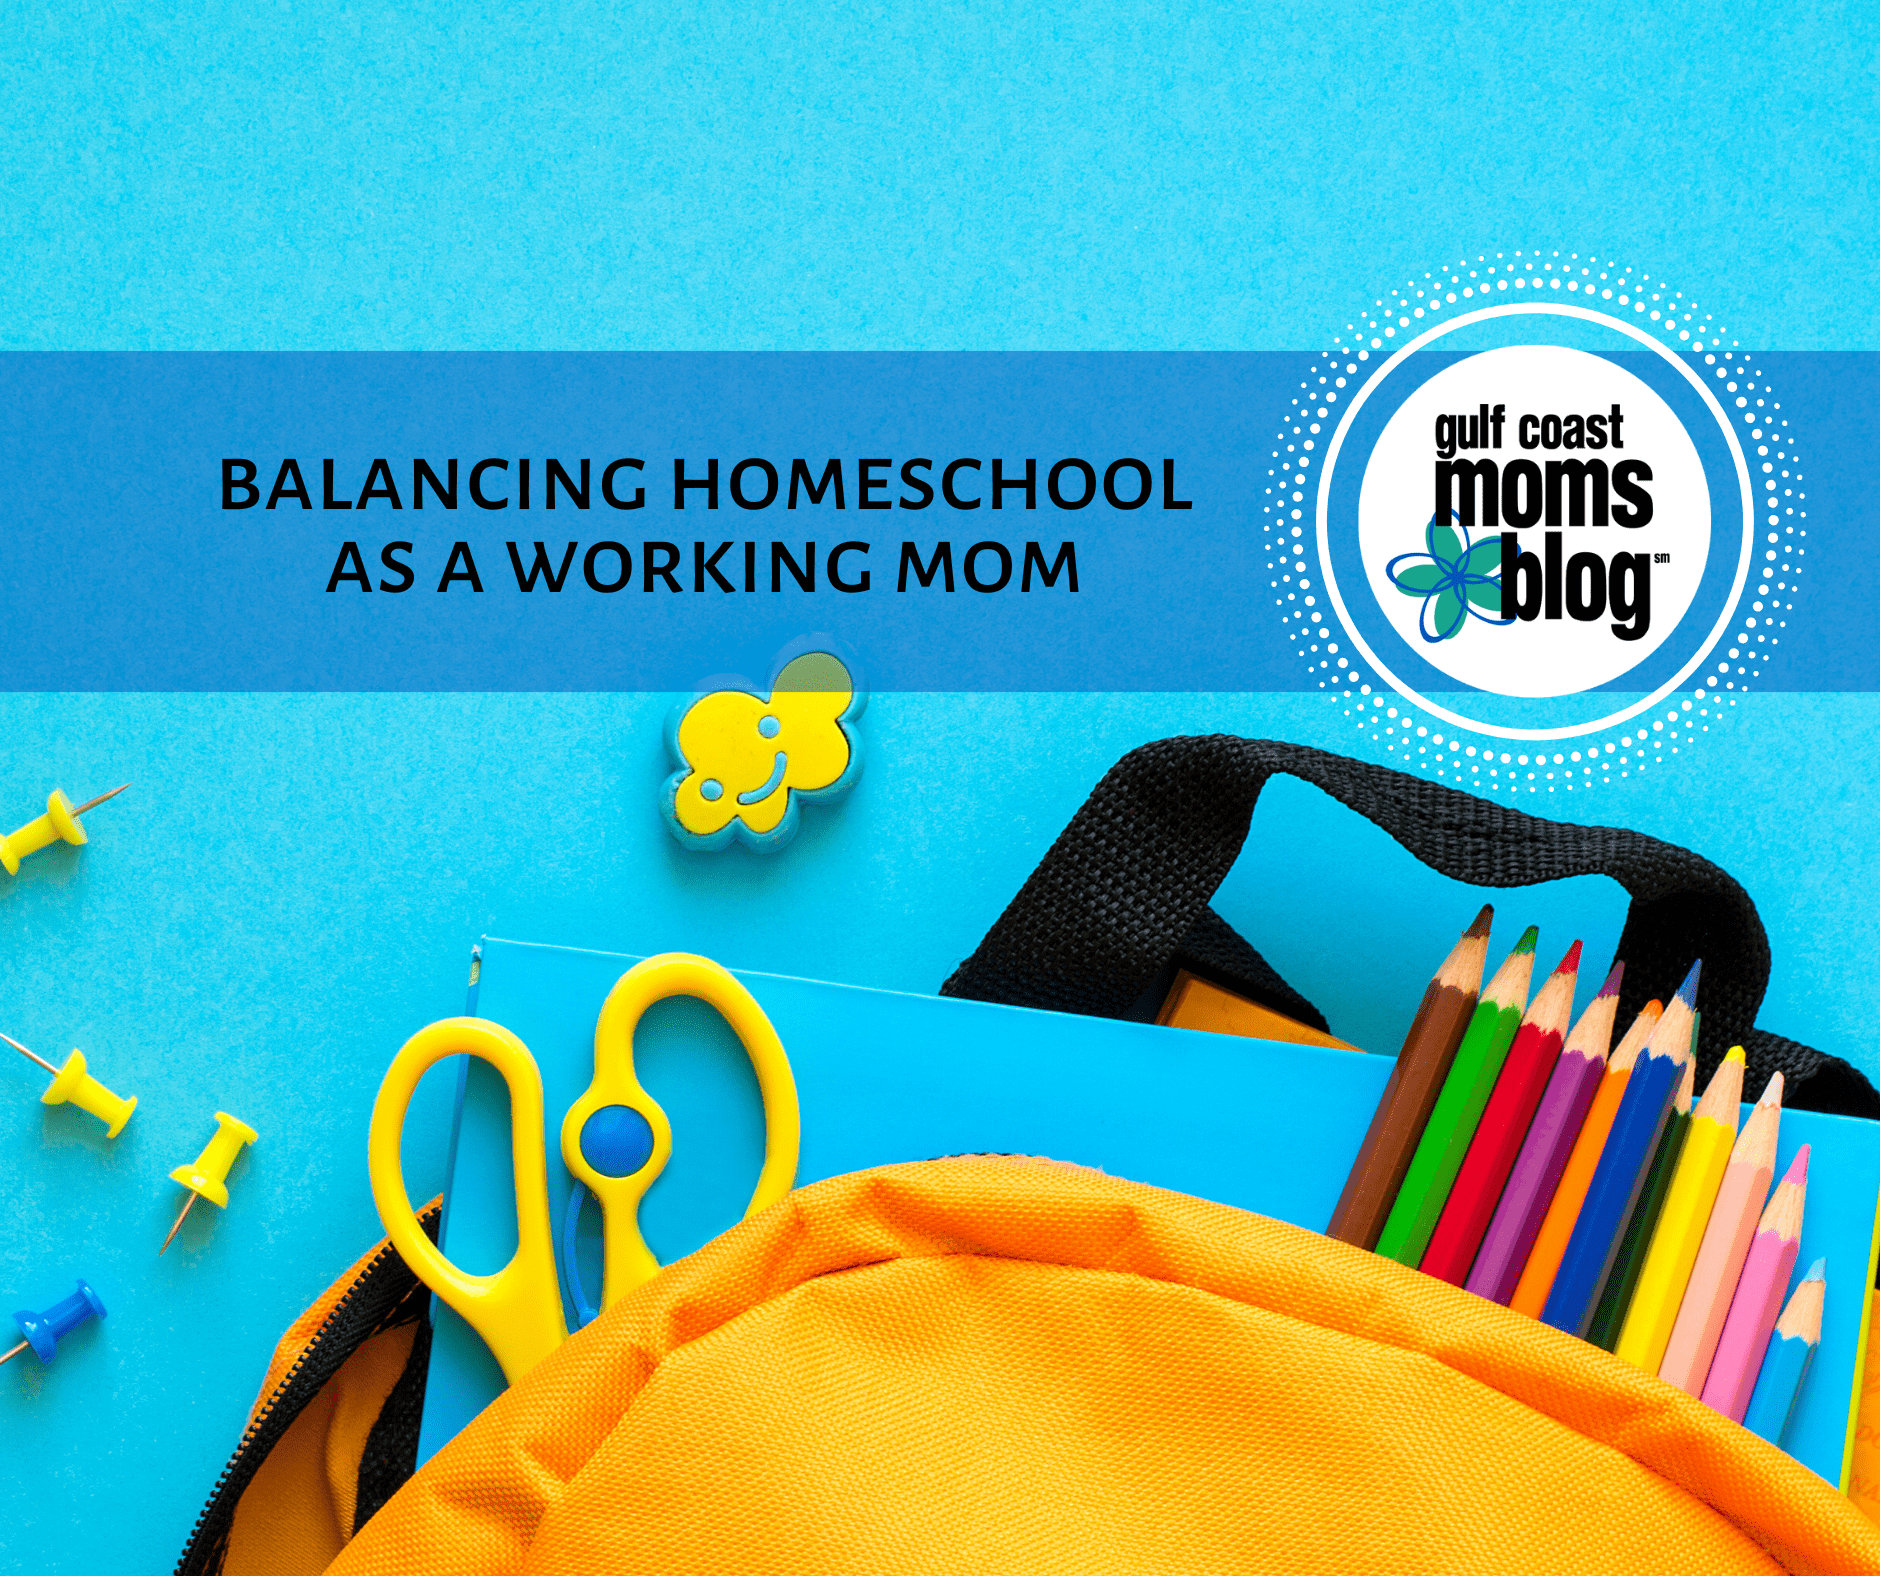 balancing homeschool as a working mom